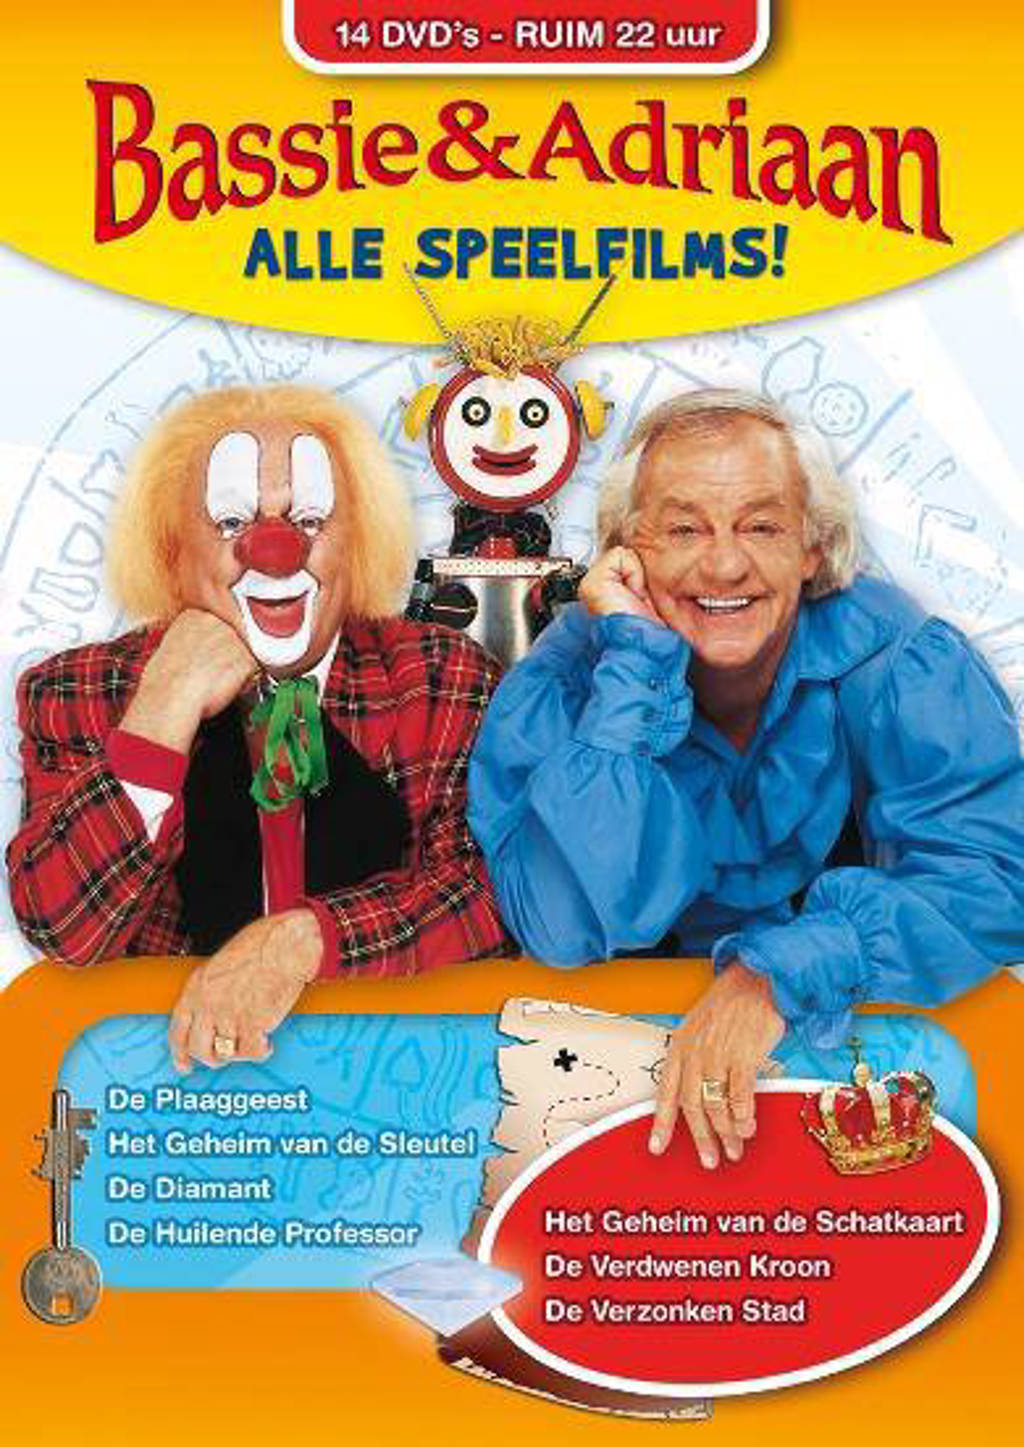 Bassie & Adriaan - Alle speelfilms (DVD)